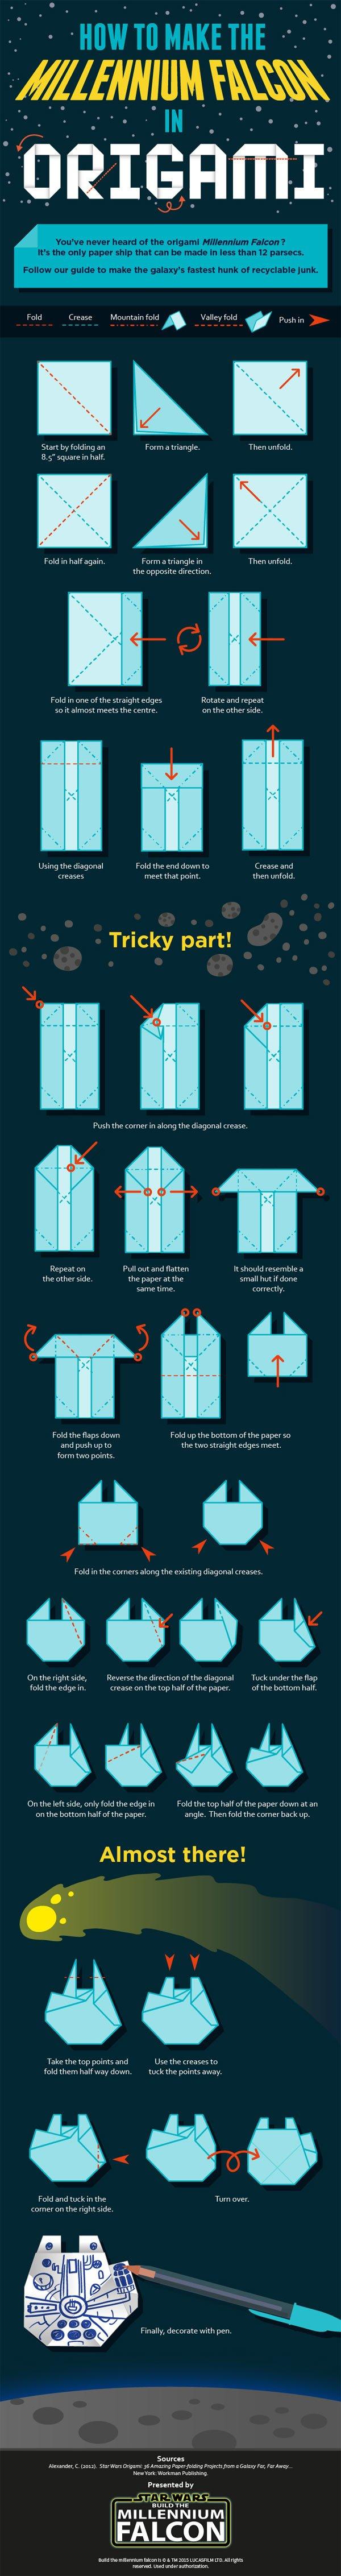 How to Make an Origami Millennium Falcon - Technabob